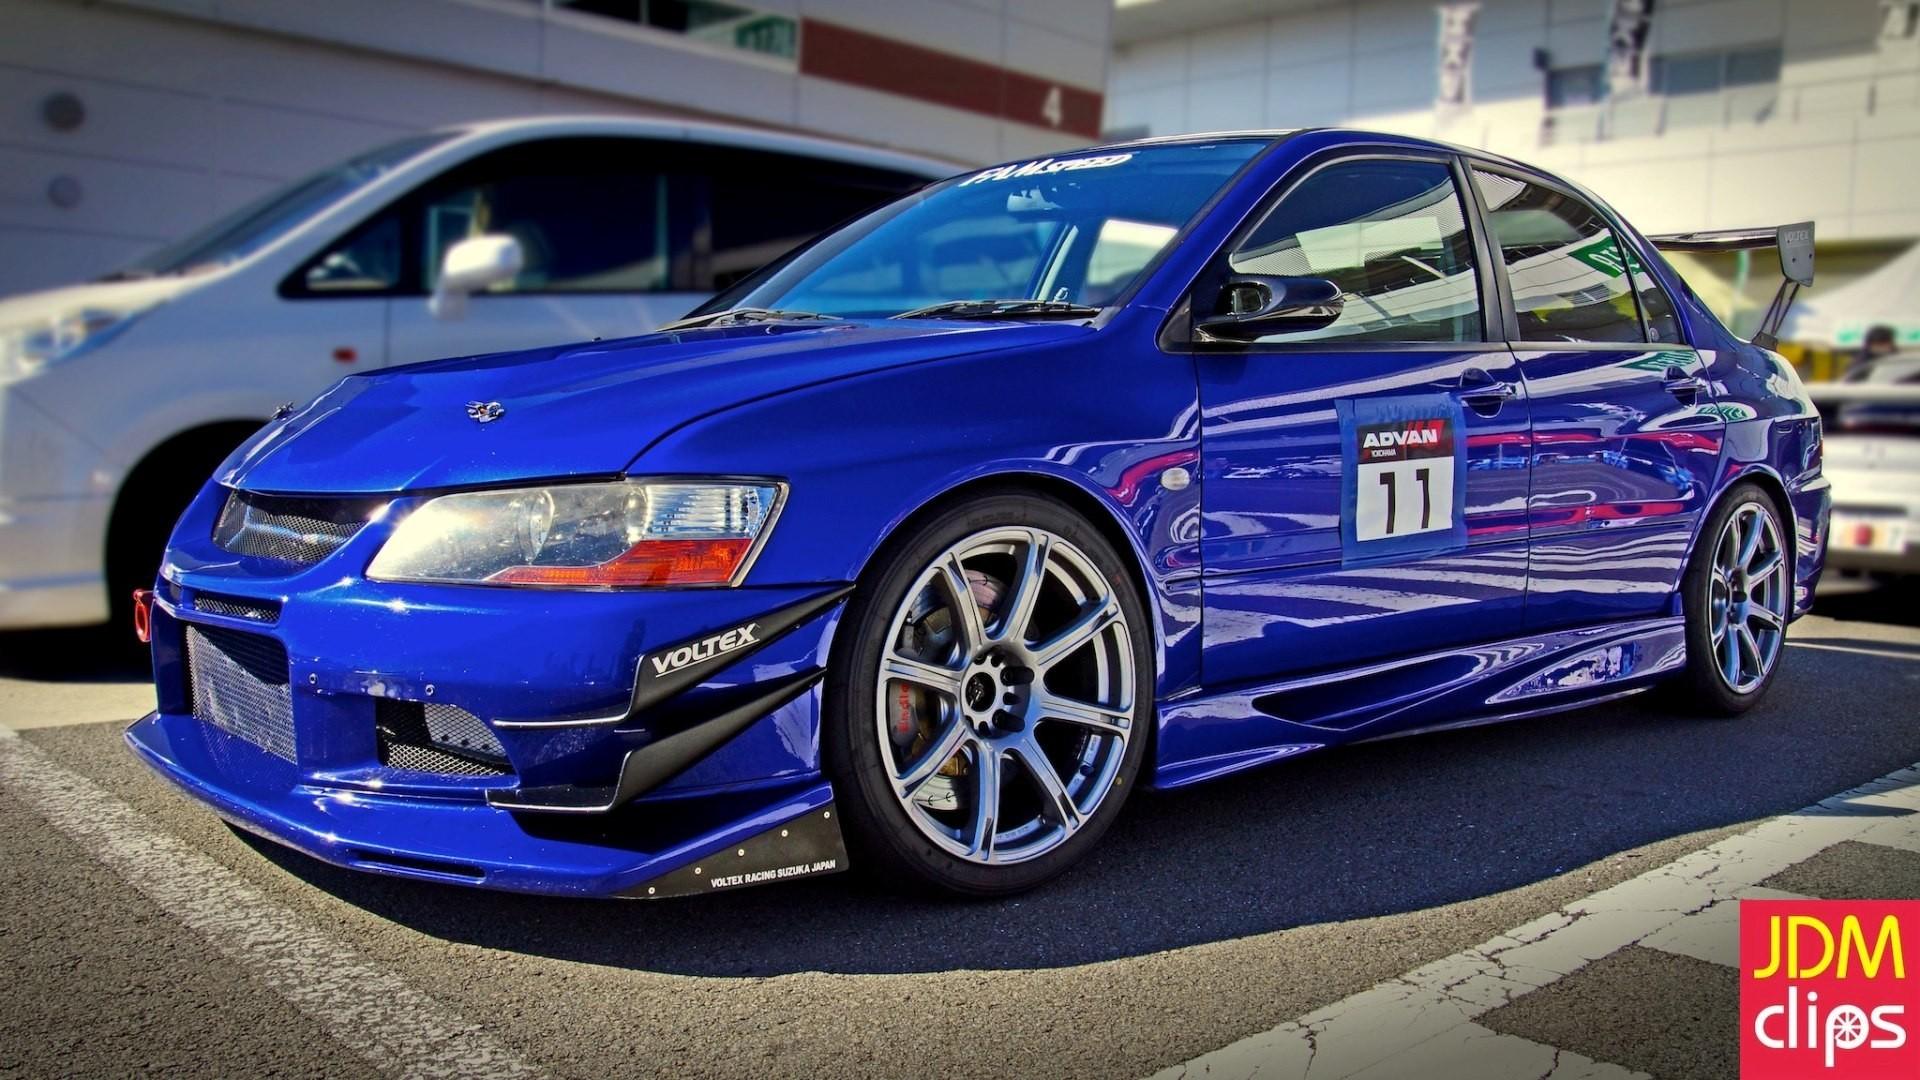 Mitsubishi Lancer Evolution IX, Mitsubishi Lancer, JDM Wallpapers HD /  Desktop and Mobile Backgrounds